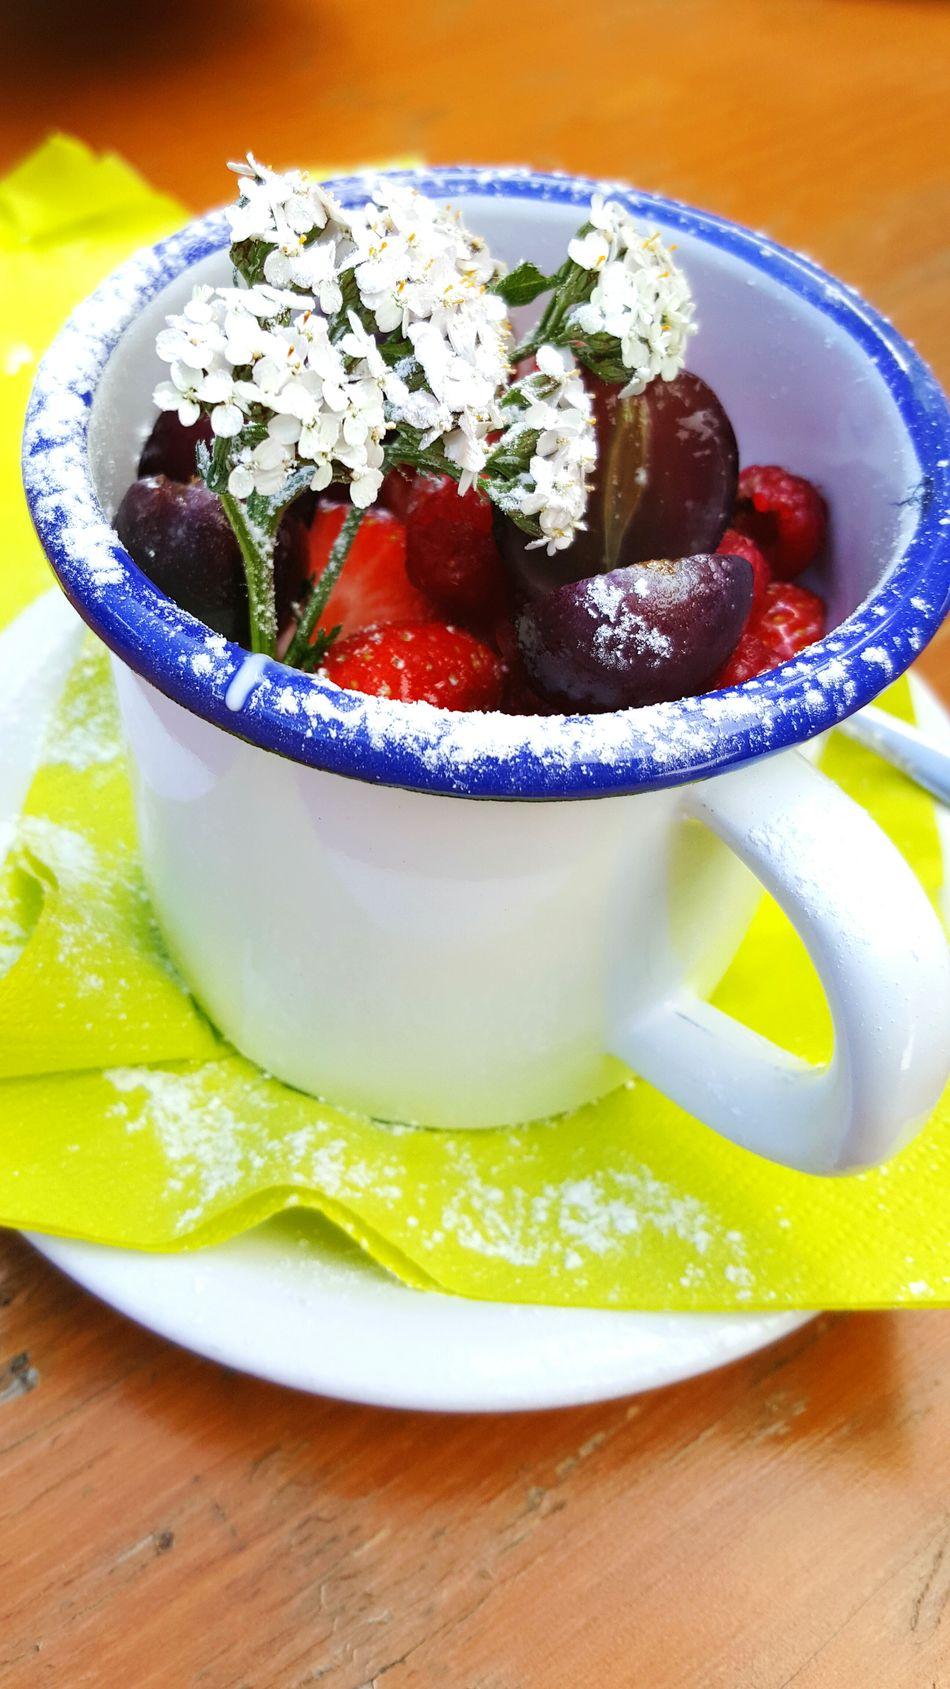 Handmade Yogurt Fruits Mountain Healthy Eating No People Freshness Ready-to-eat Flower Food First Eyeem Photo